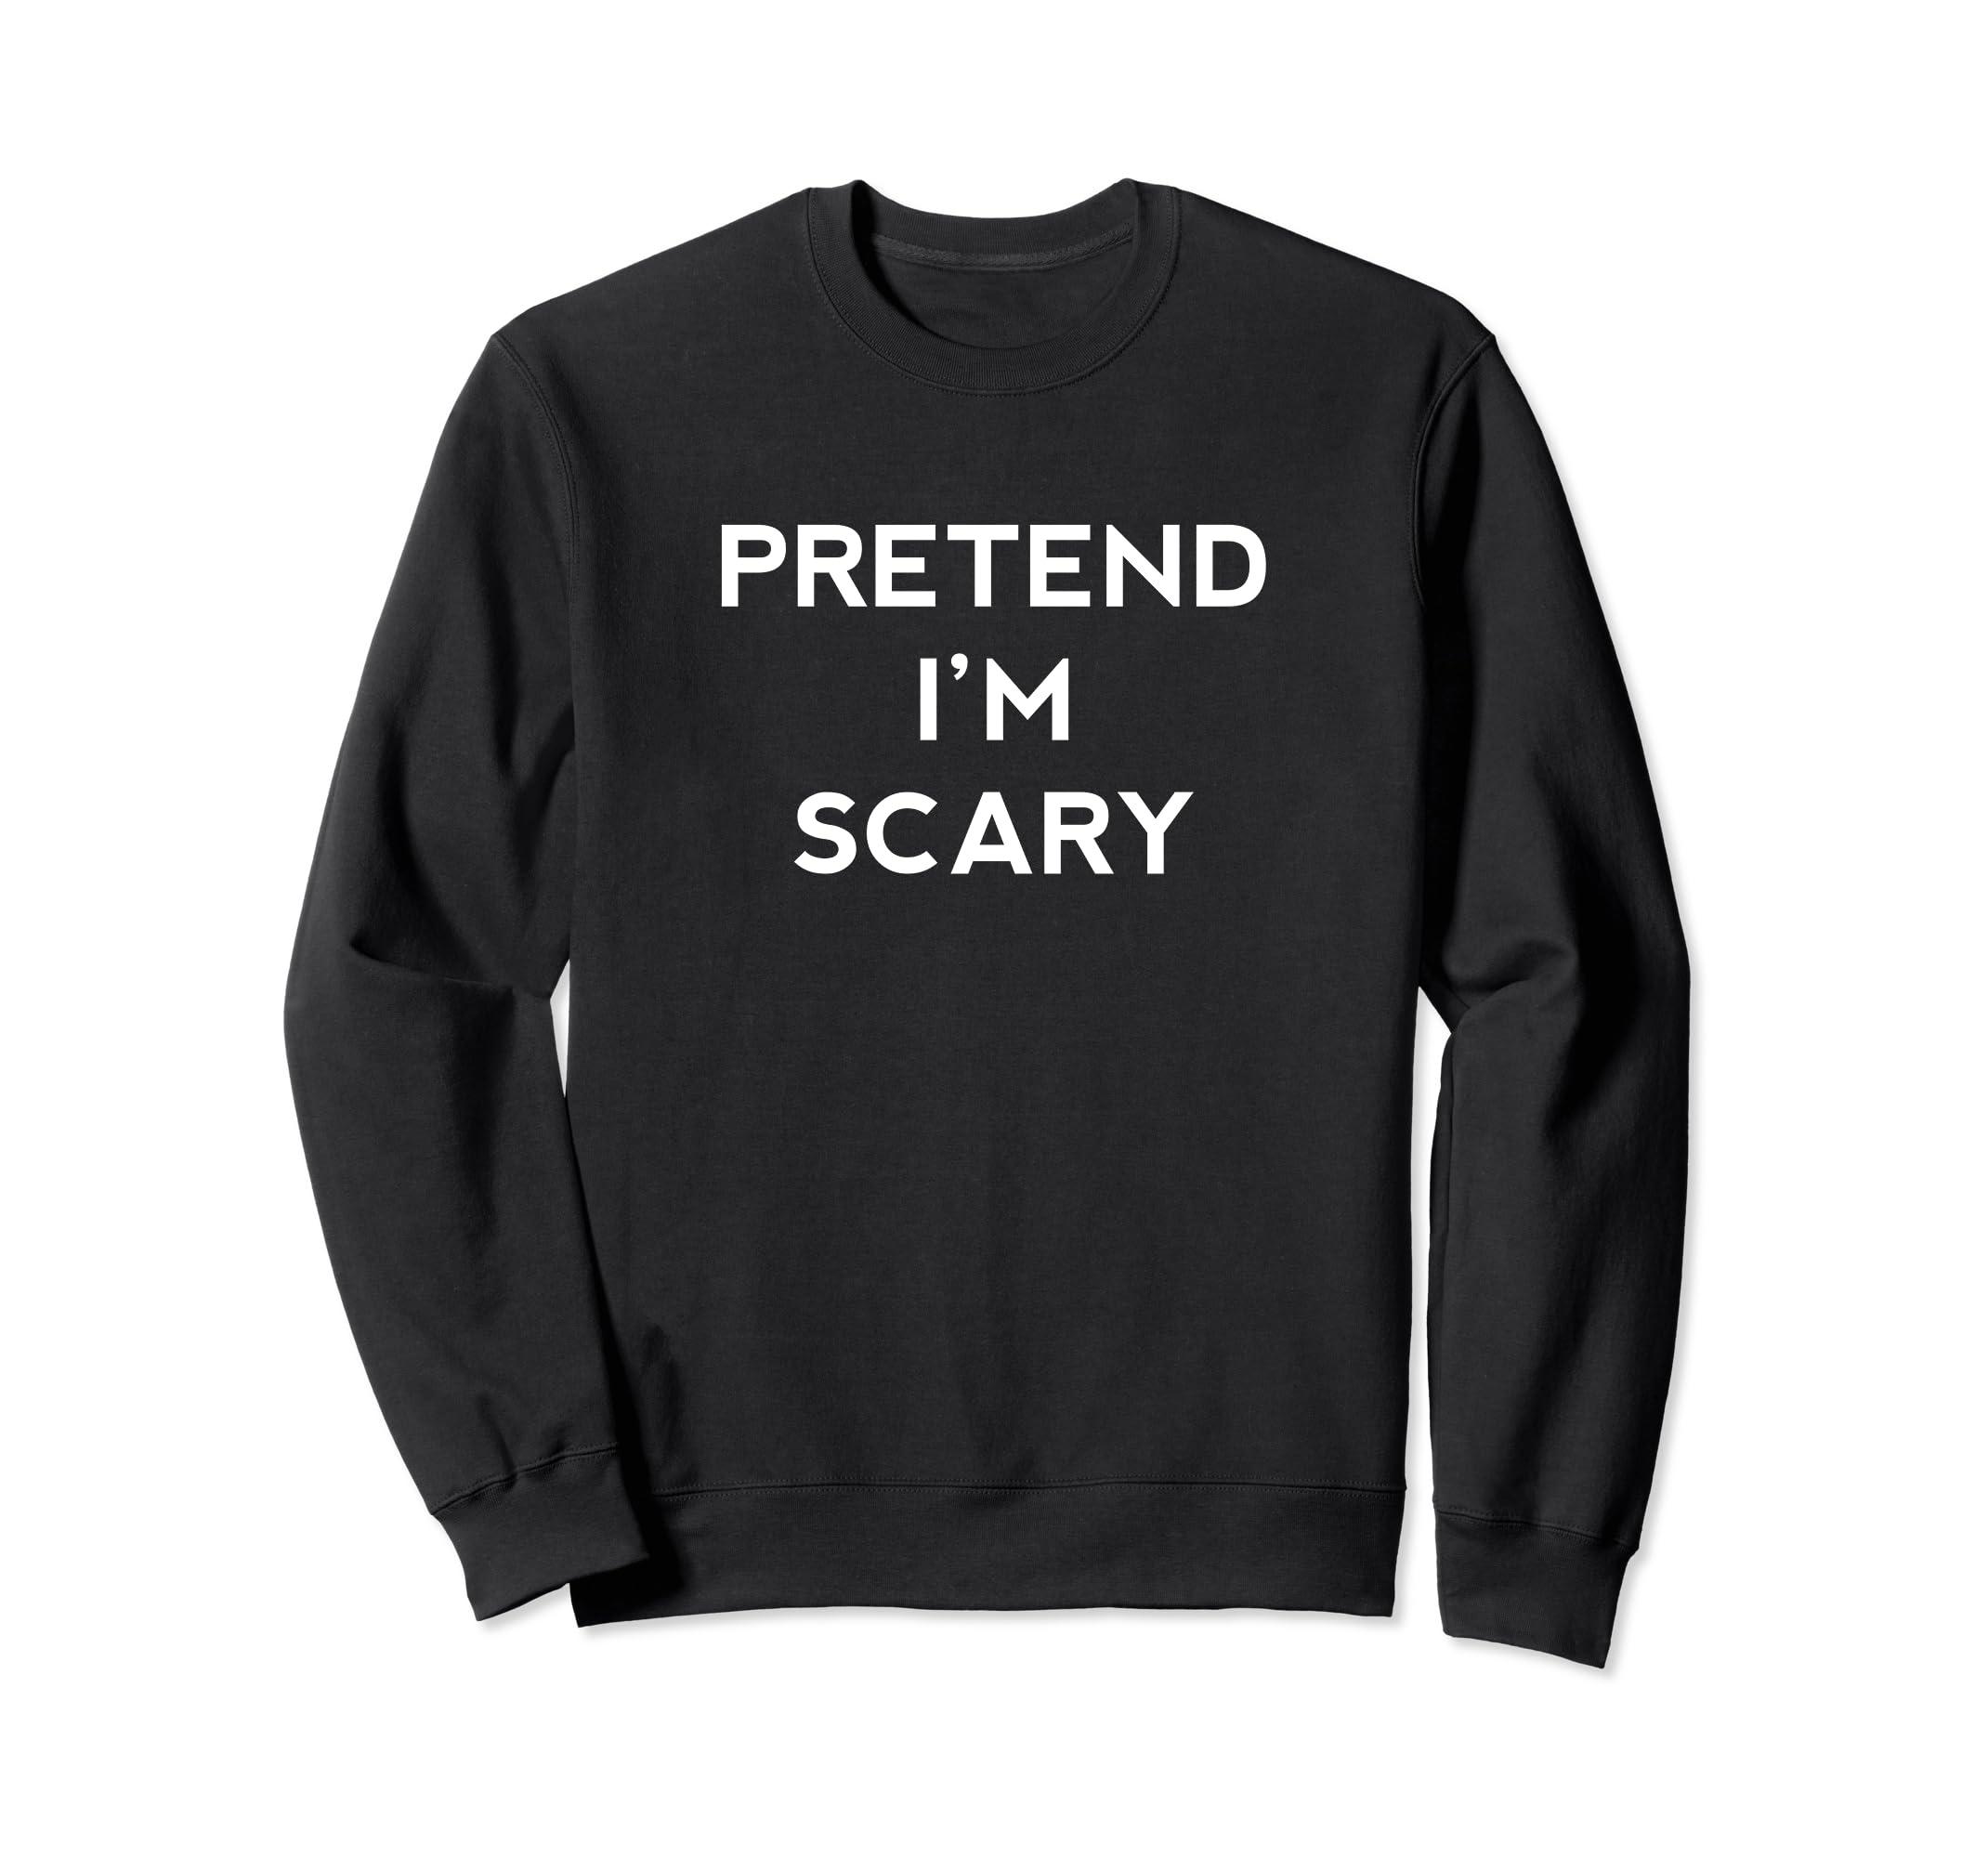 f100157c4 Amazon.com: Pretend I'm Scary Funny Last Minute Halloween Sweatshirt:  Clothing